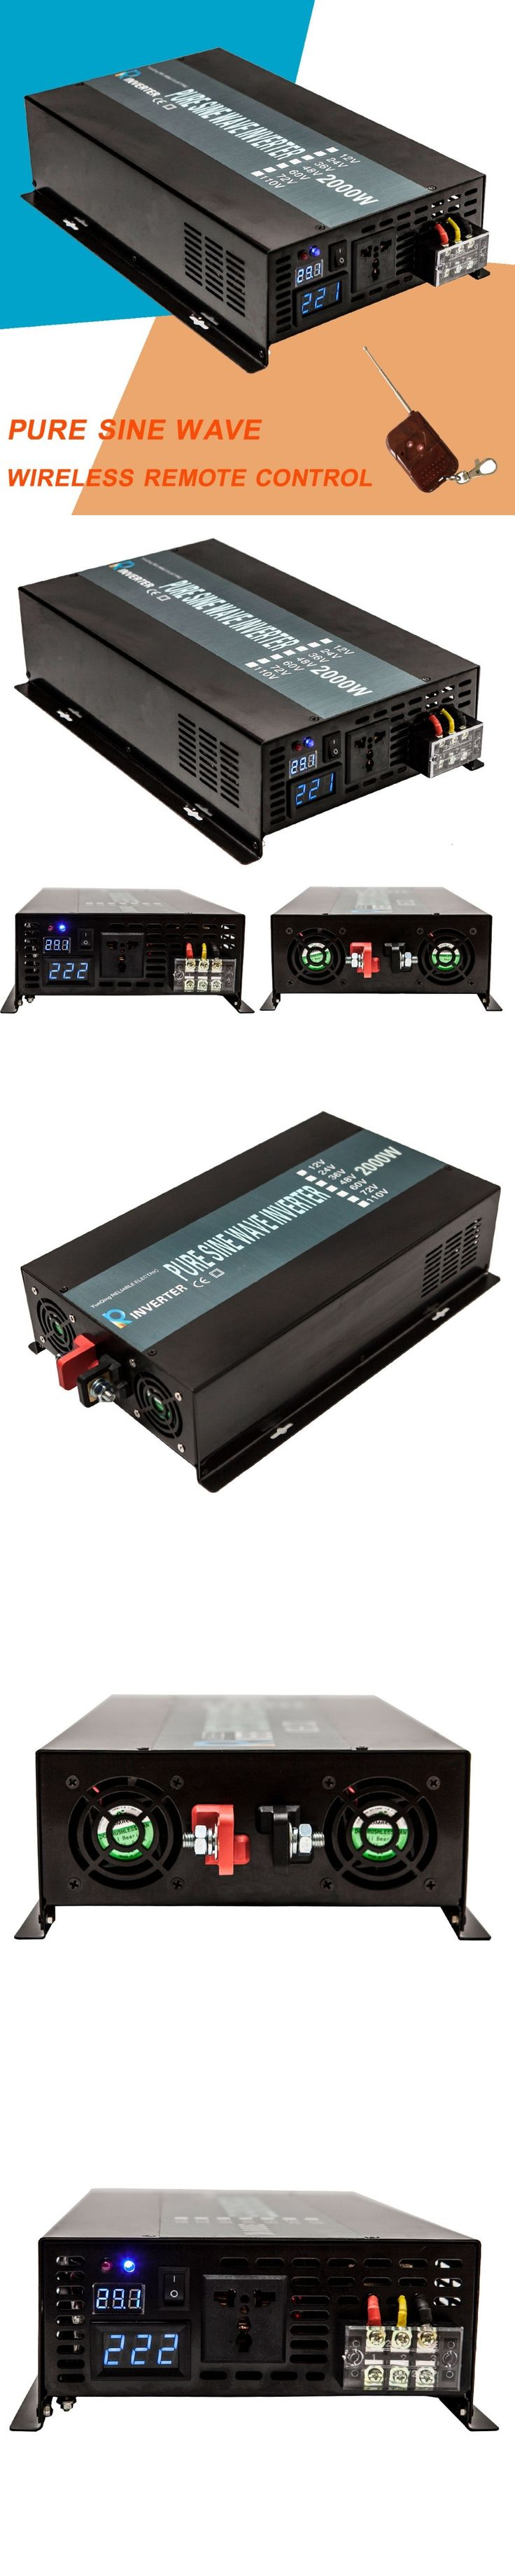 LED Display 2000W 12V 220V DC AC Converter High Frequency Converter Pure Sine Wave Solar Power Inverter For Refrigerator, TV